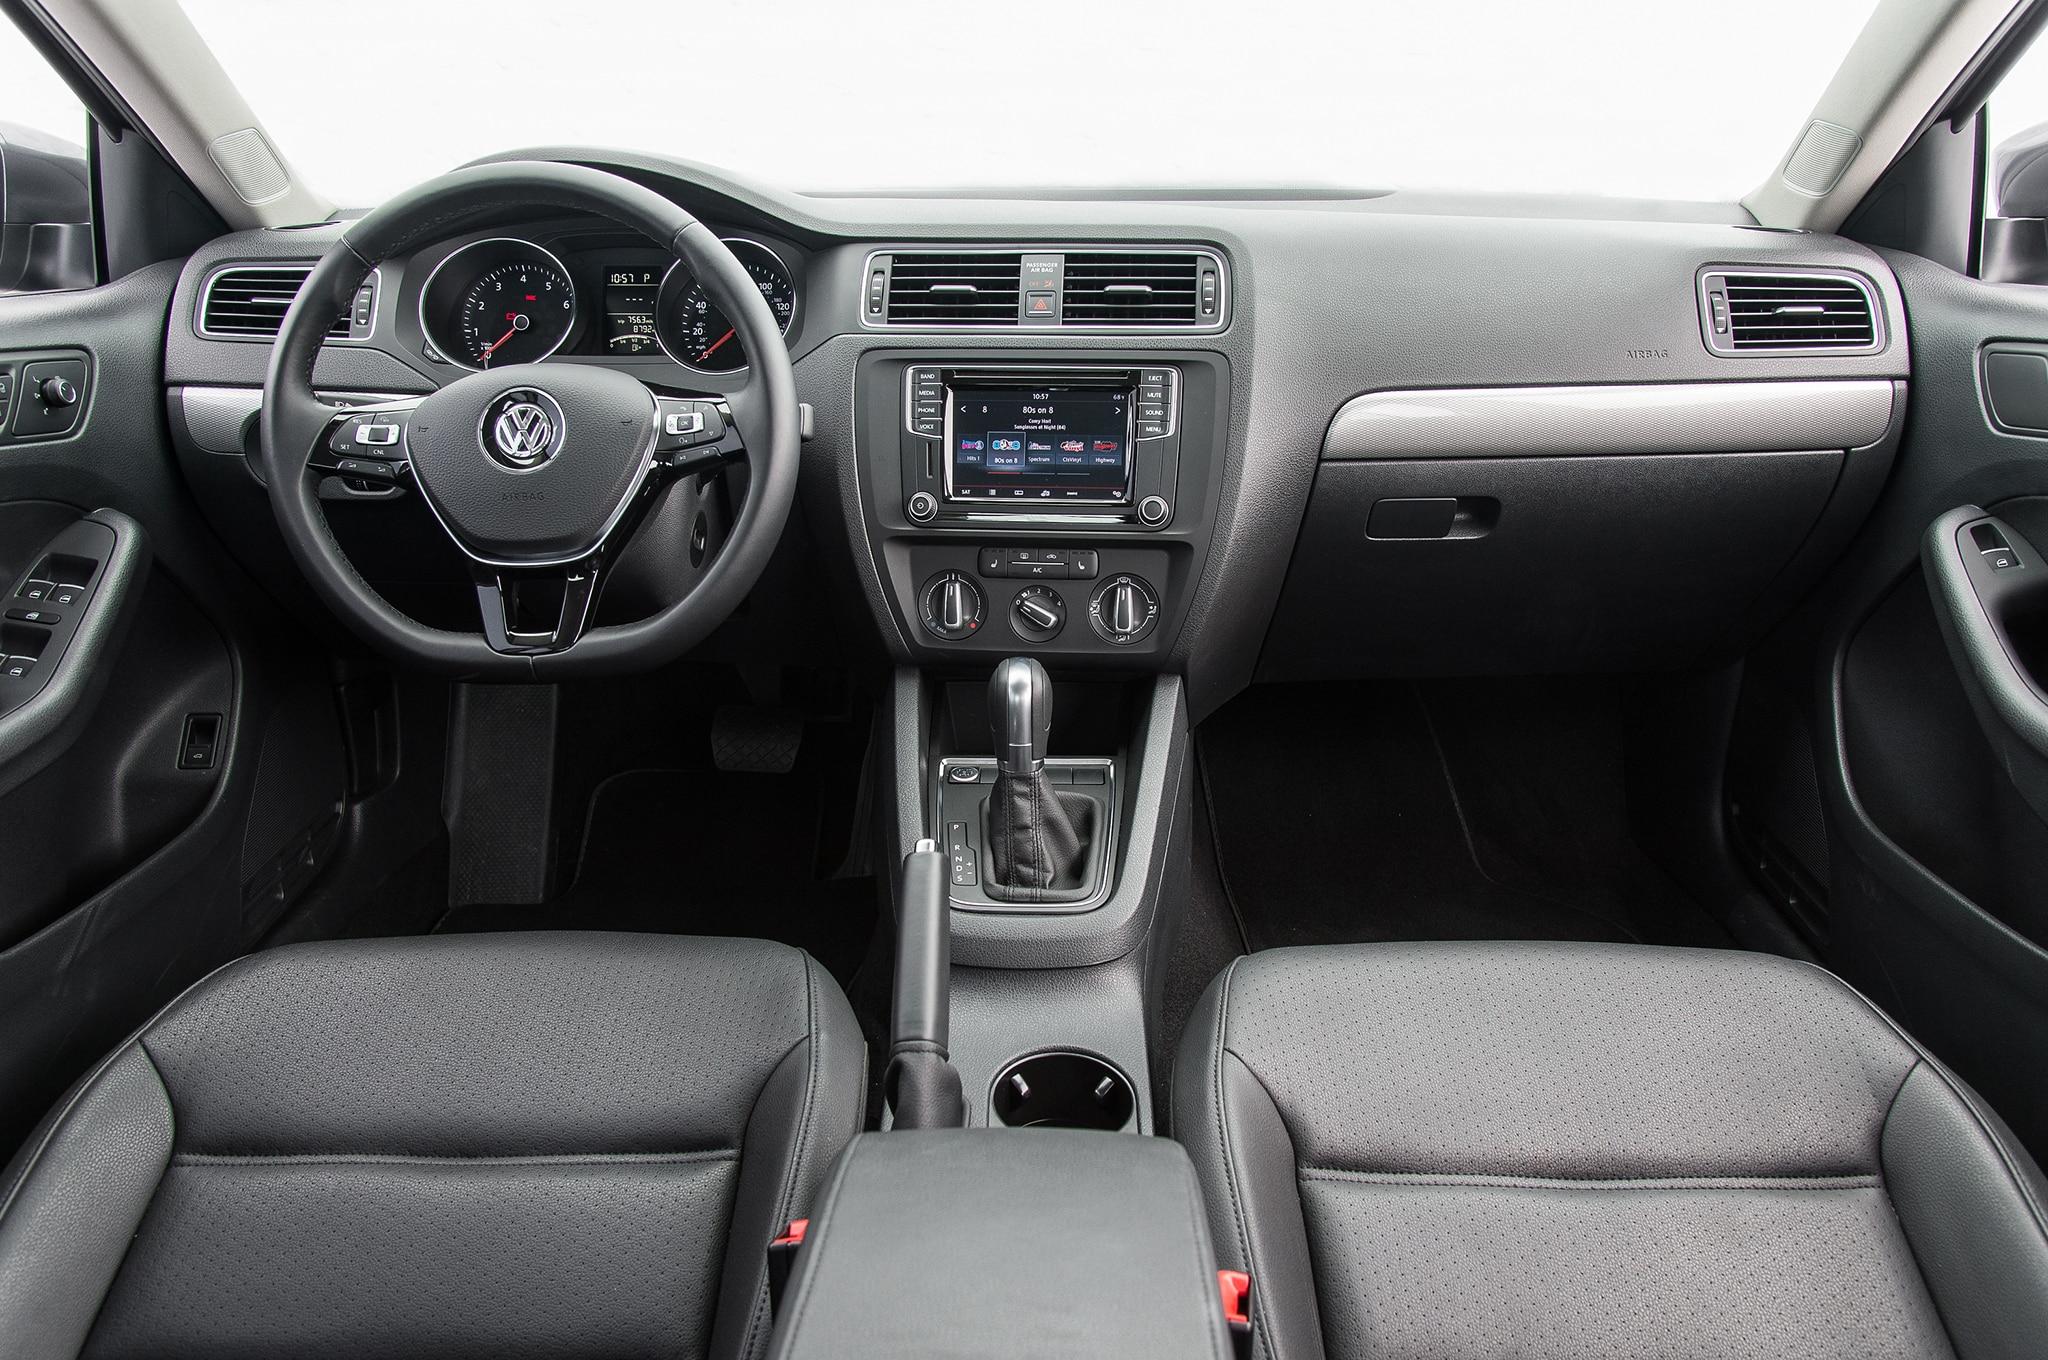 2017 Volkswagen Jetta 1.4 T Se >> Volkswagen Jetta 1.4T SE 2016: Primera Prueba